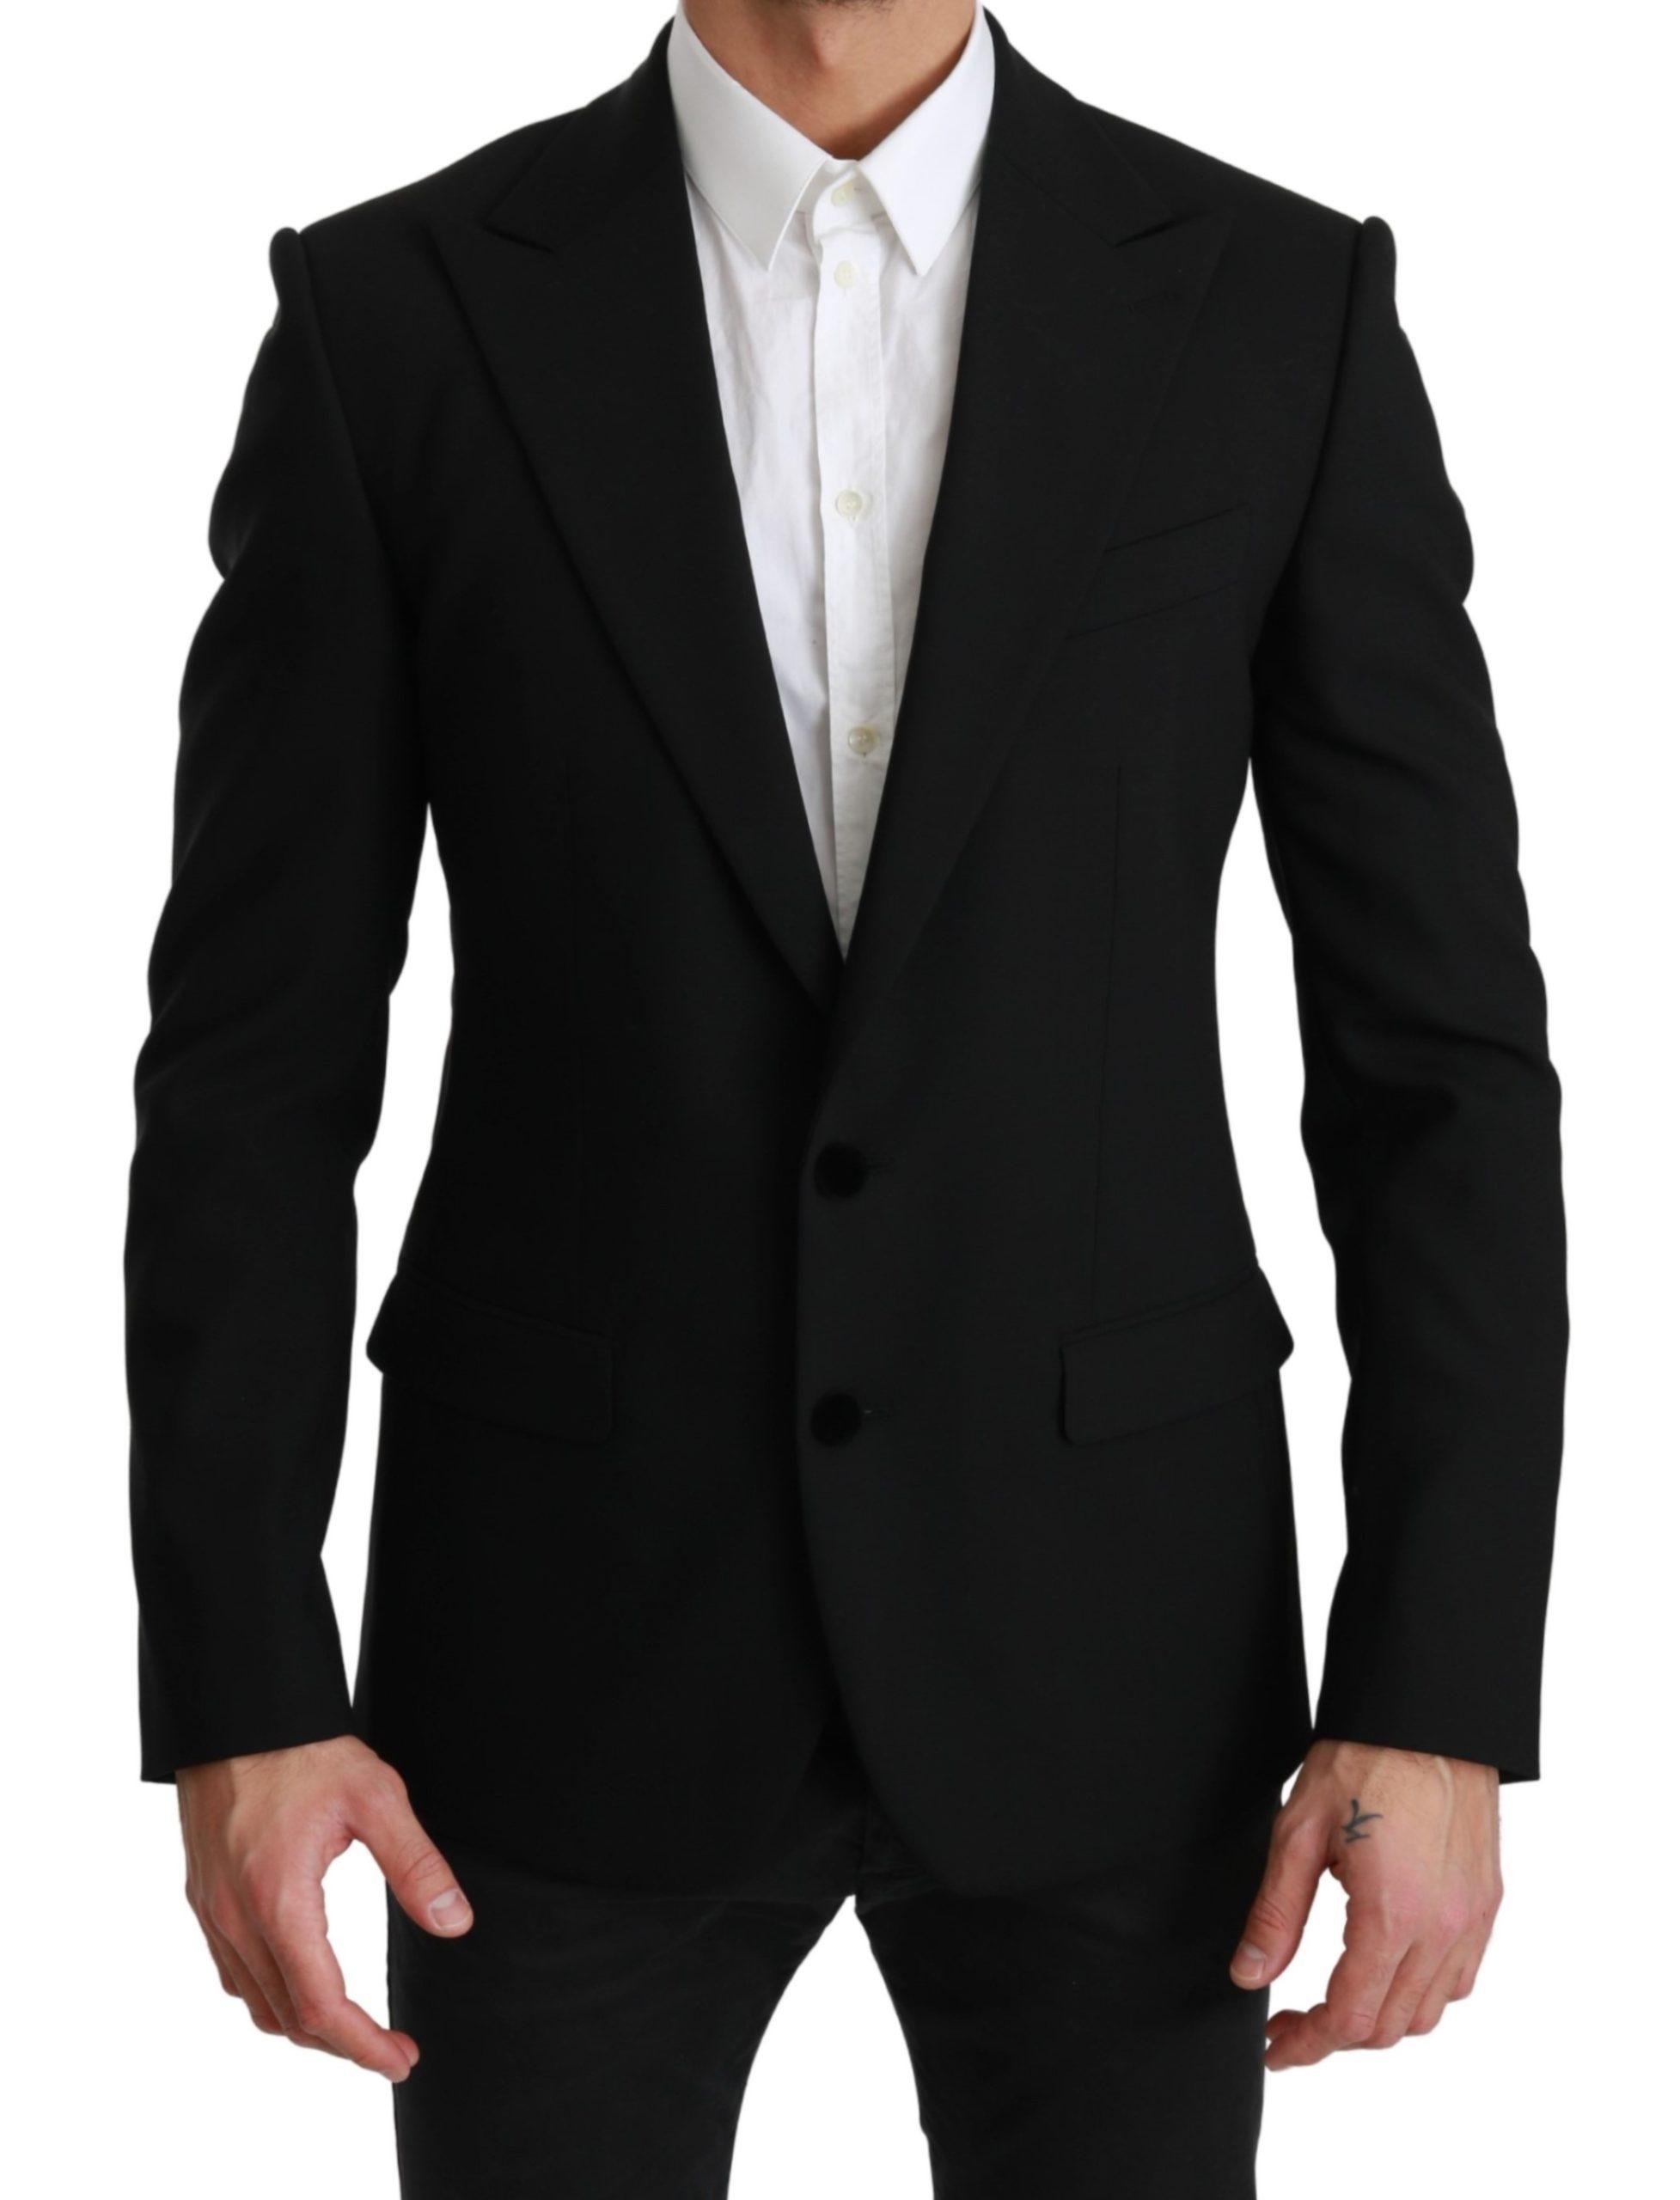 Dolce & Gabbana Men's Solid Wool Stretch MARTINI Blazer Black JKT2513 - IT46 | S